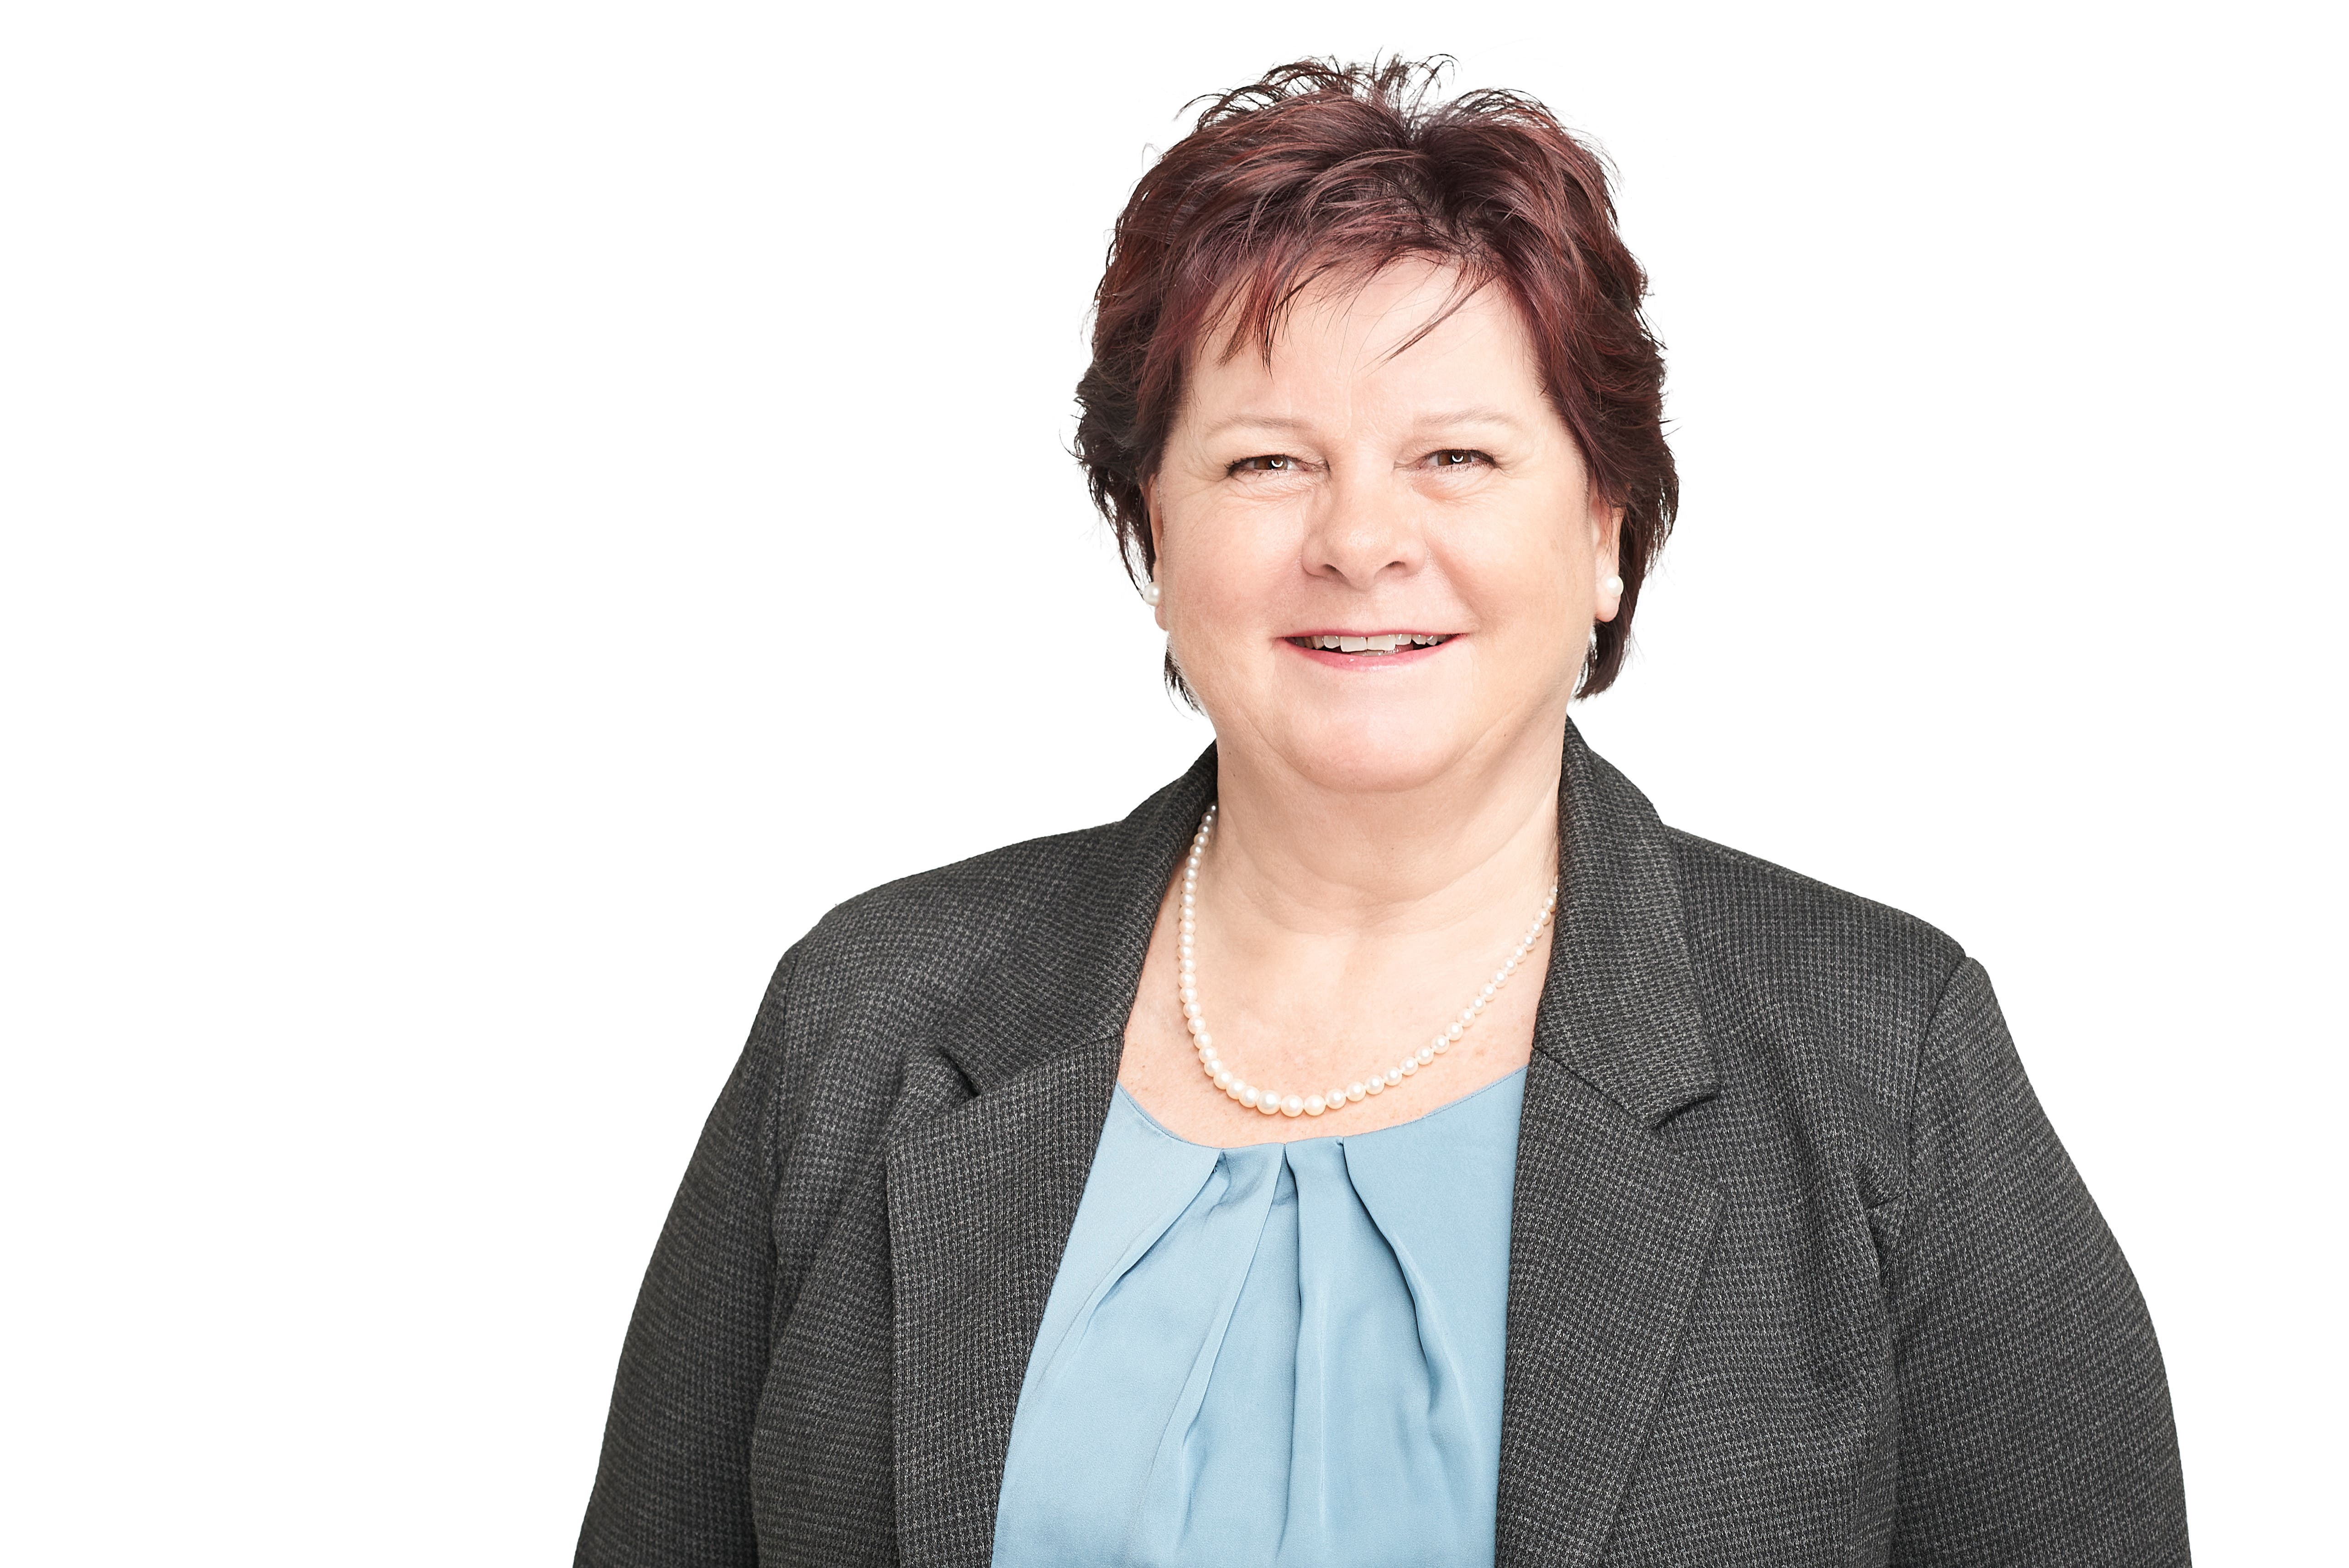 Yolanda Ammann-Korner, FDP